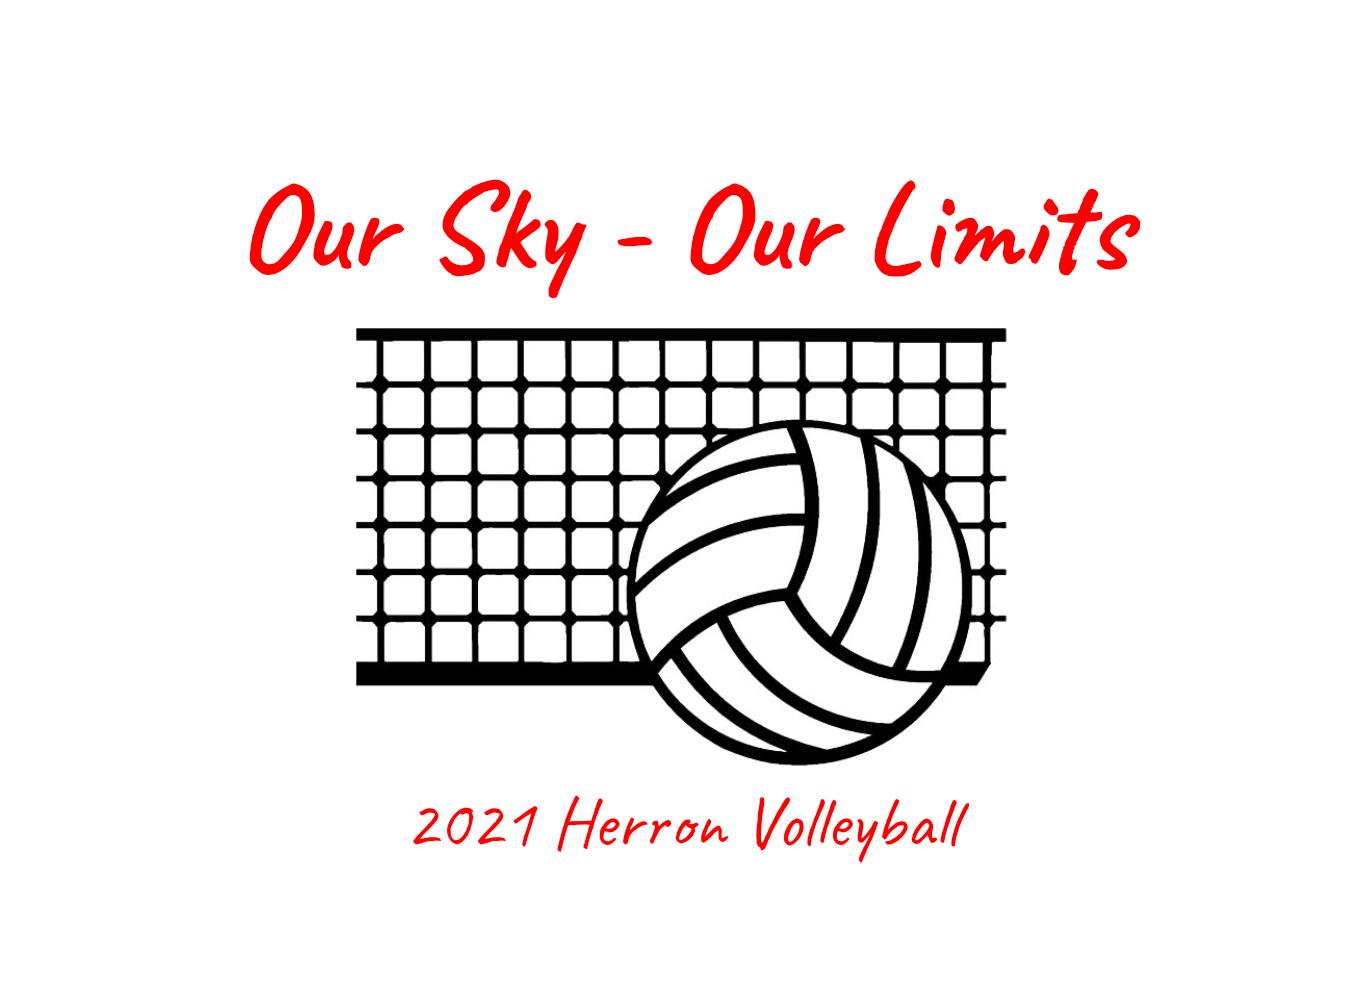 Herron Volleyball Summer Training Questions